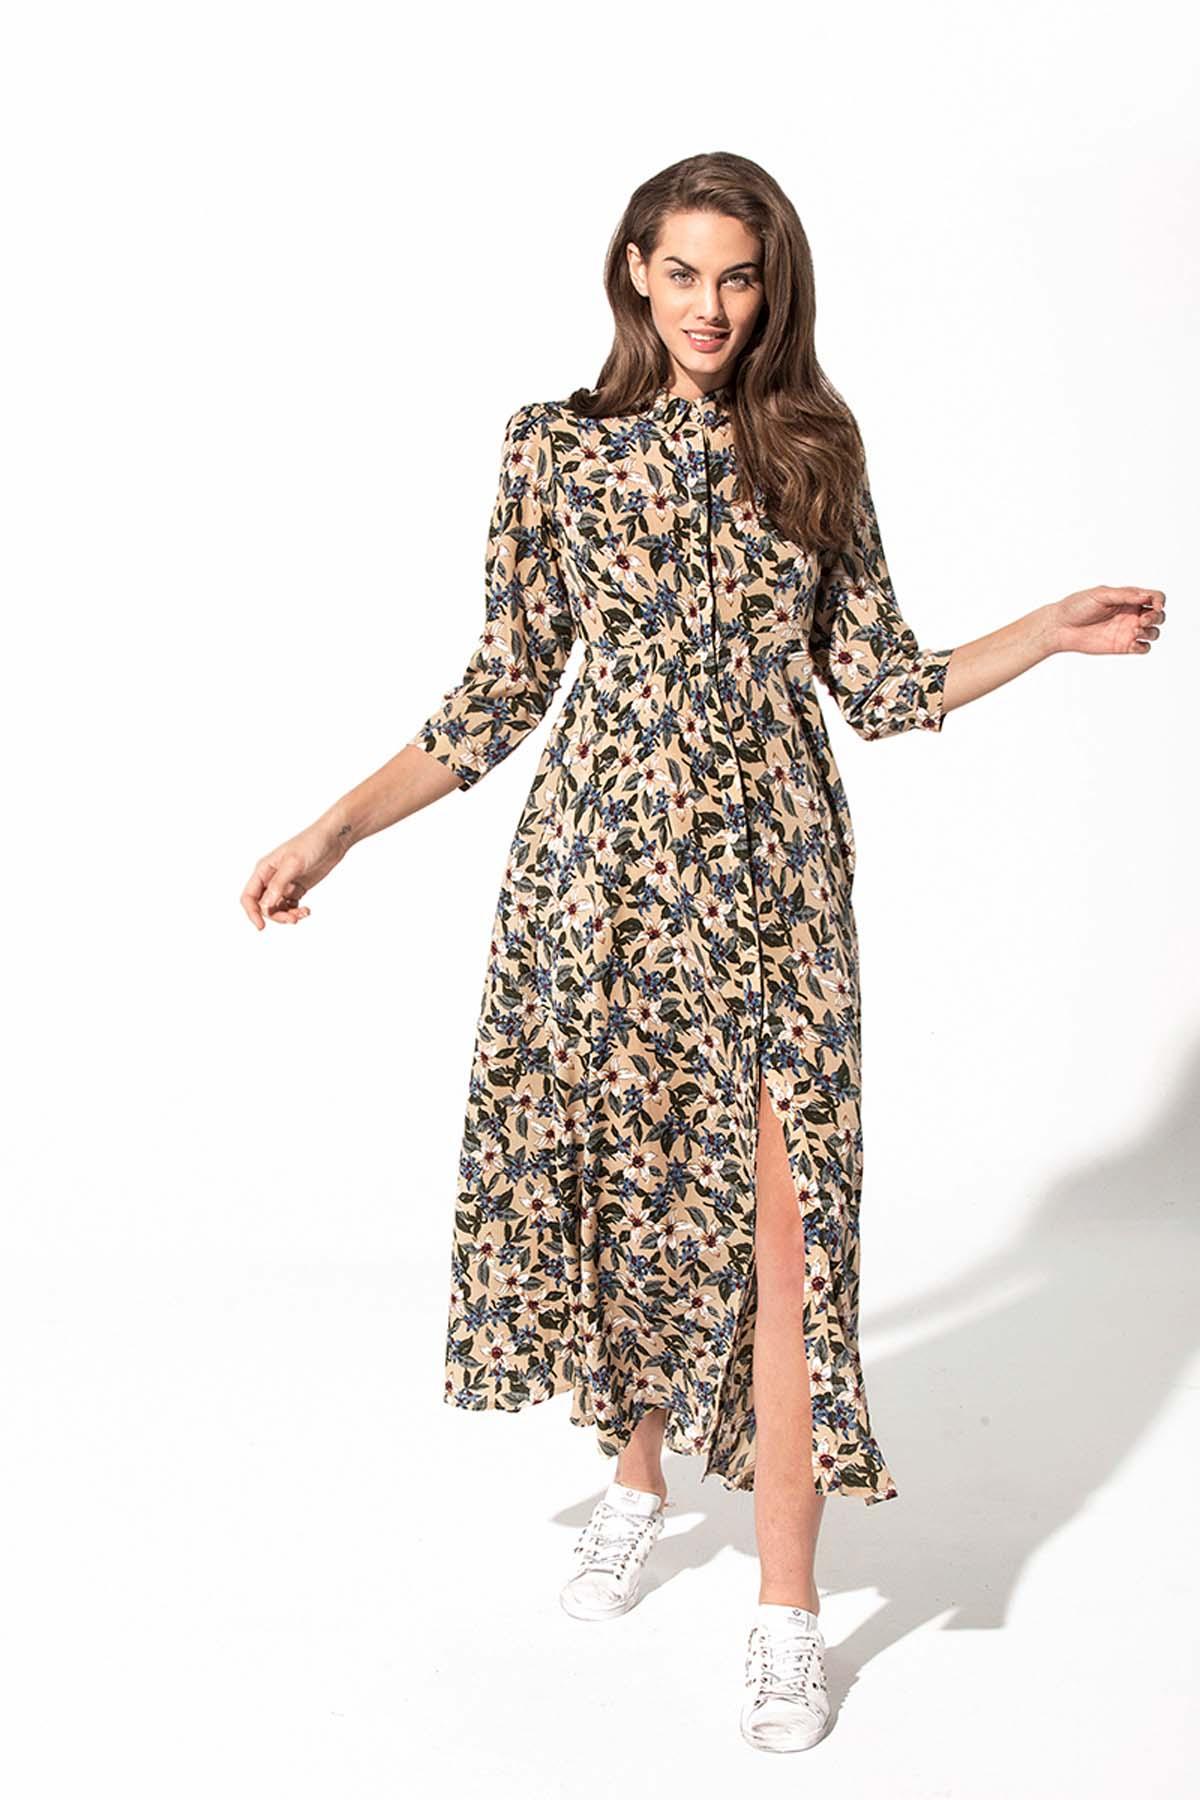 Vestido corte camisero Teria Yabar - Vestido corte camisero